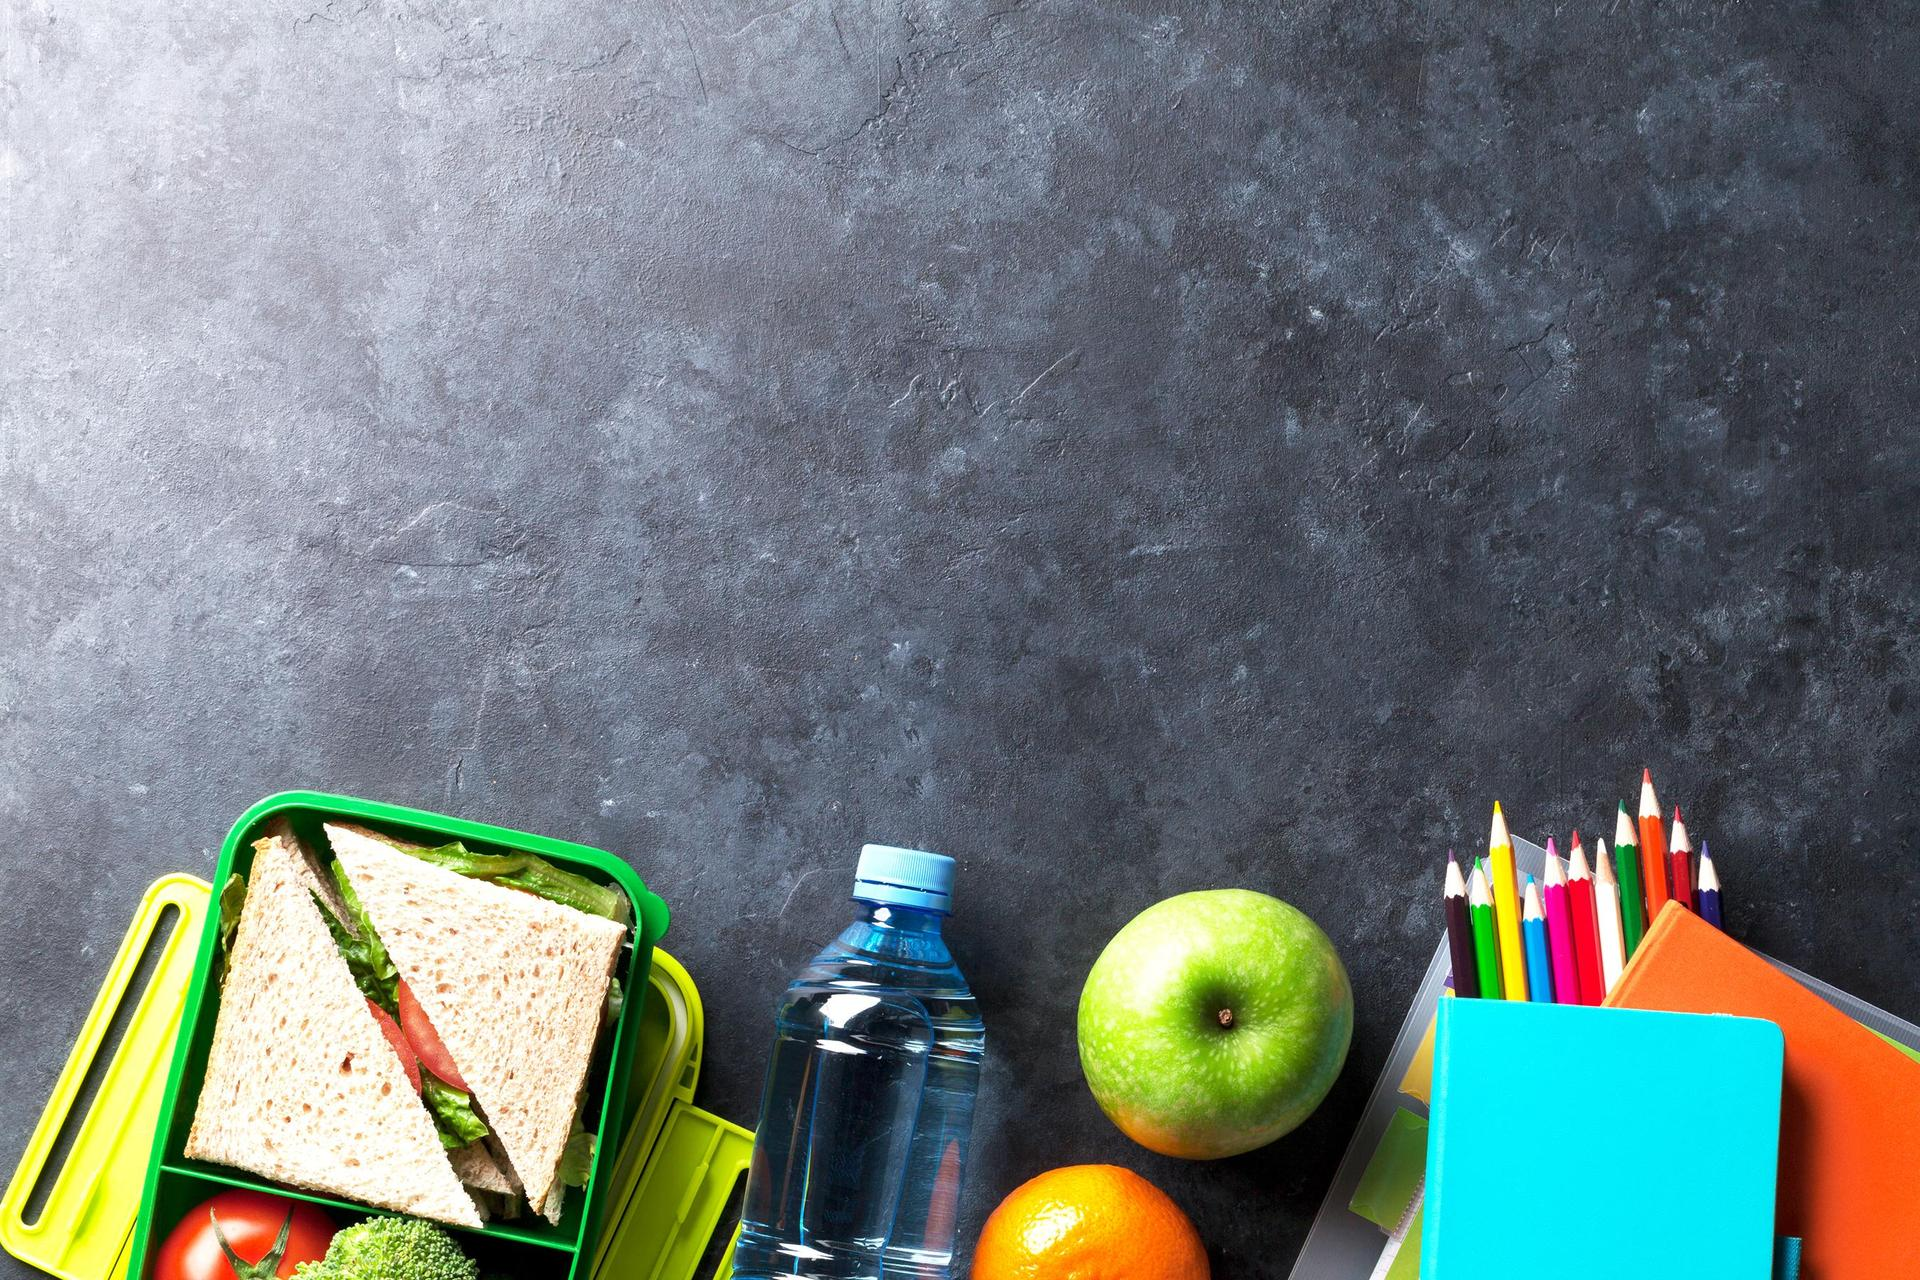 Food against a blackboard background